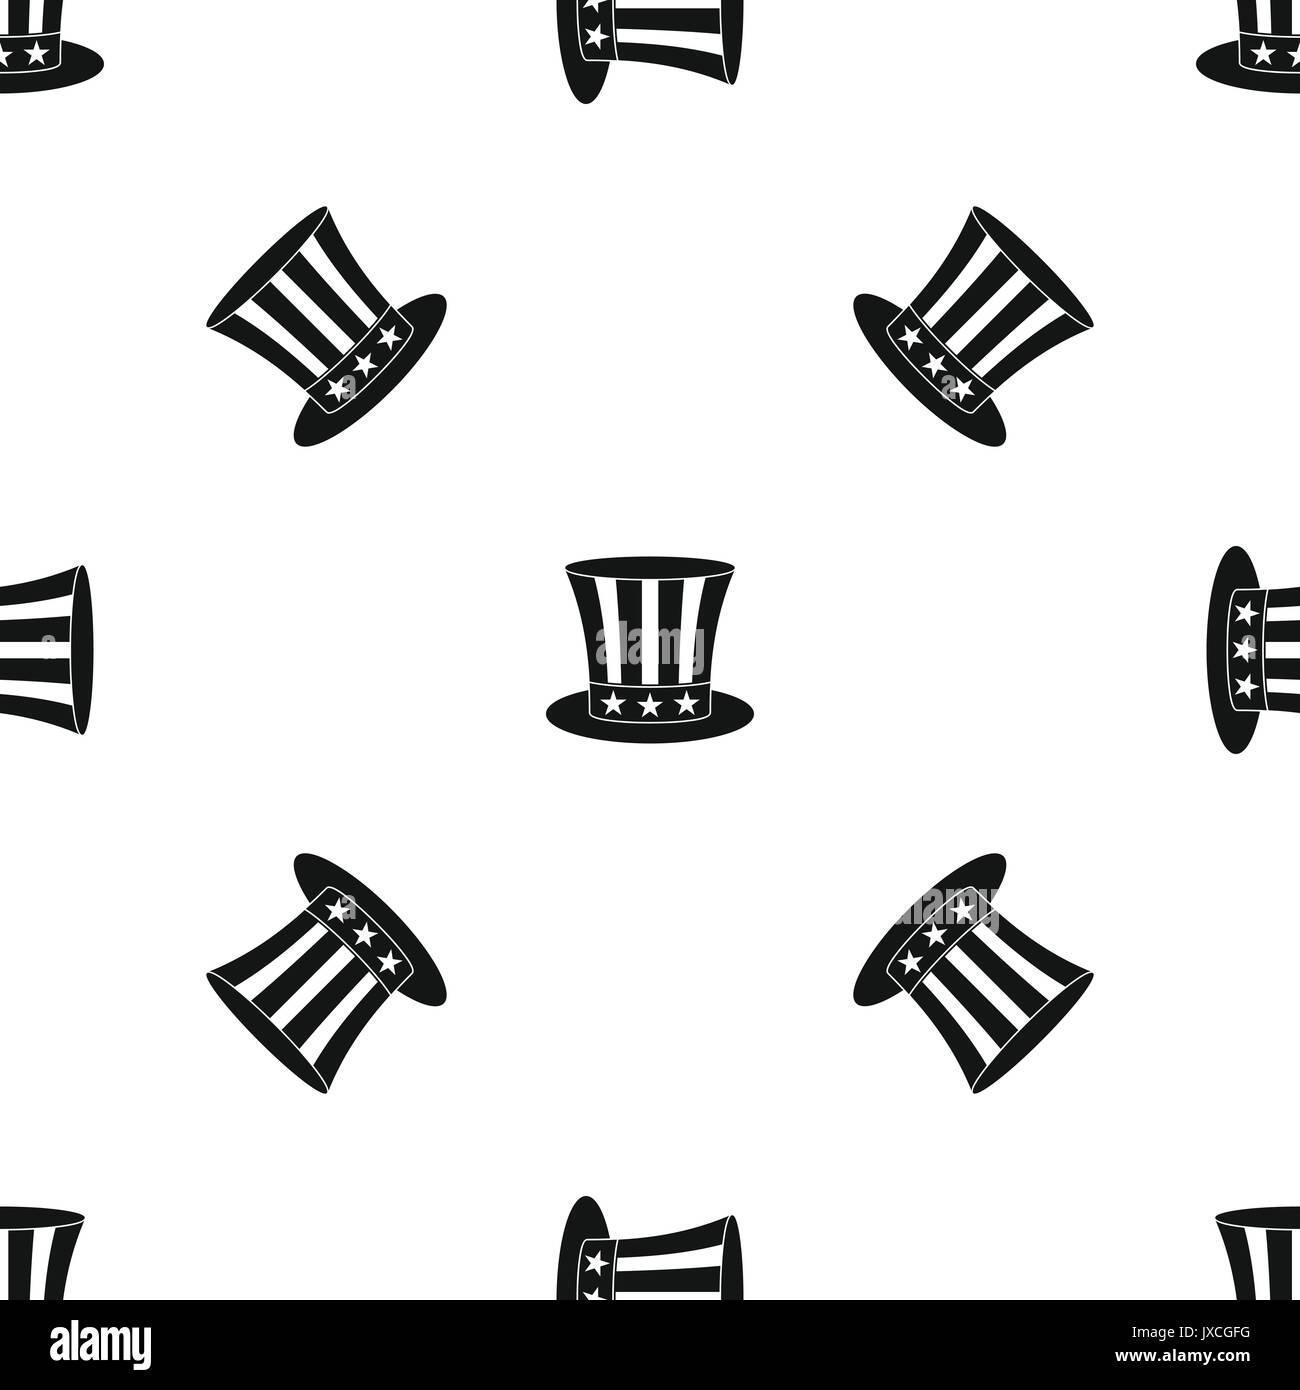 uncle sam hat pattern seamless black stock vector art illustration